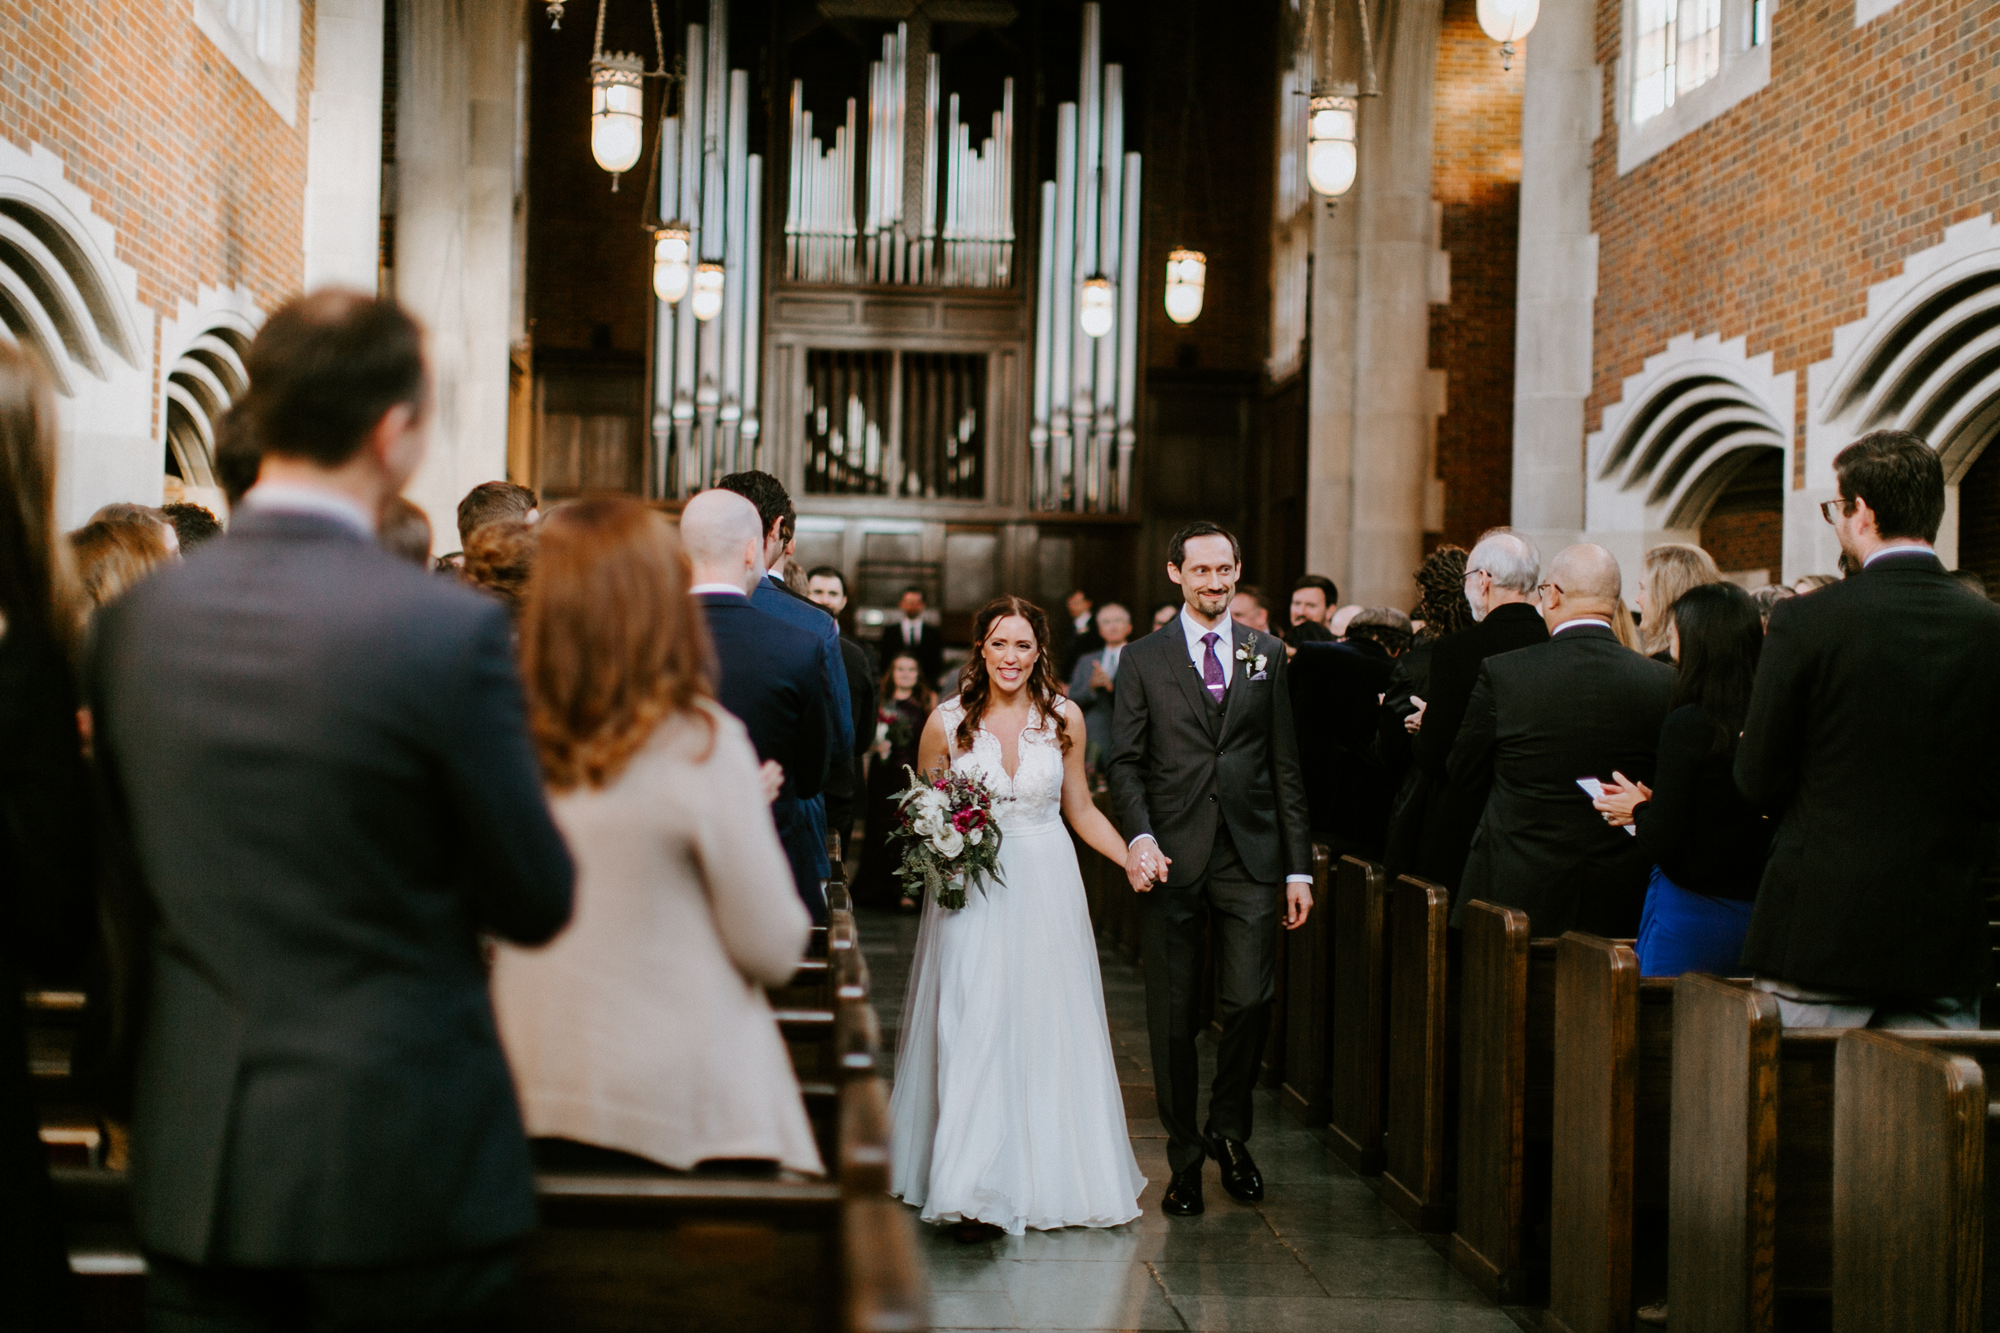 man and woman walking down the aisle at wedding